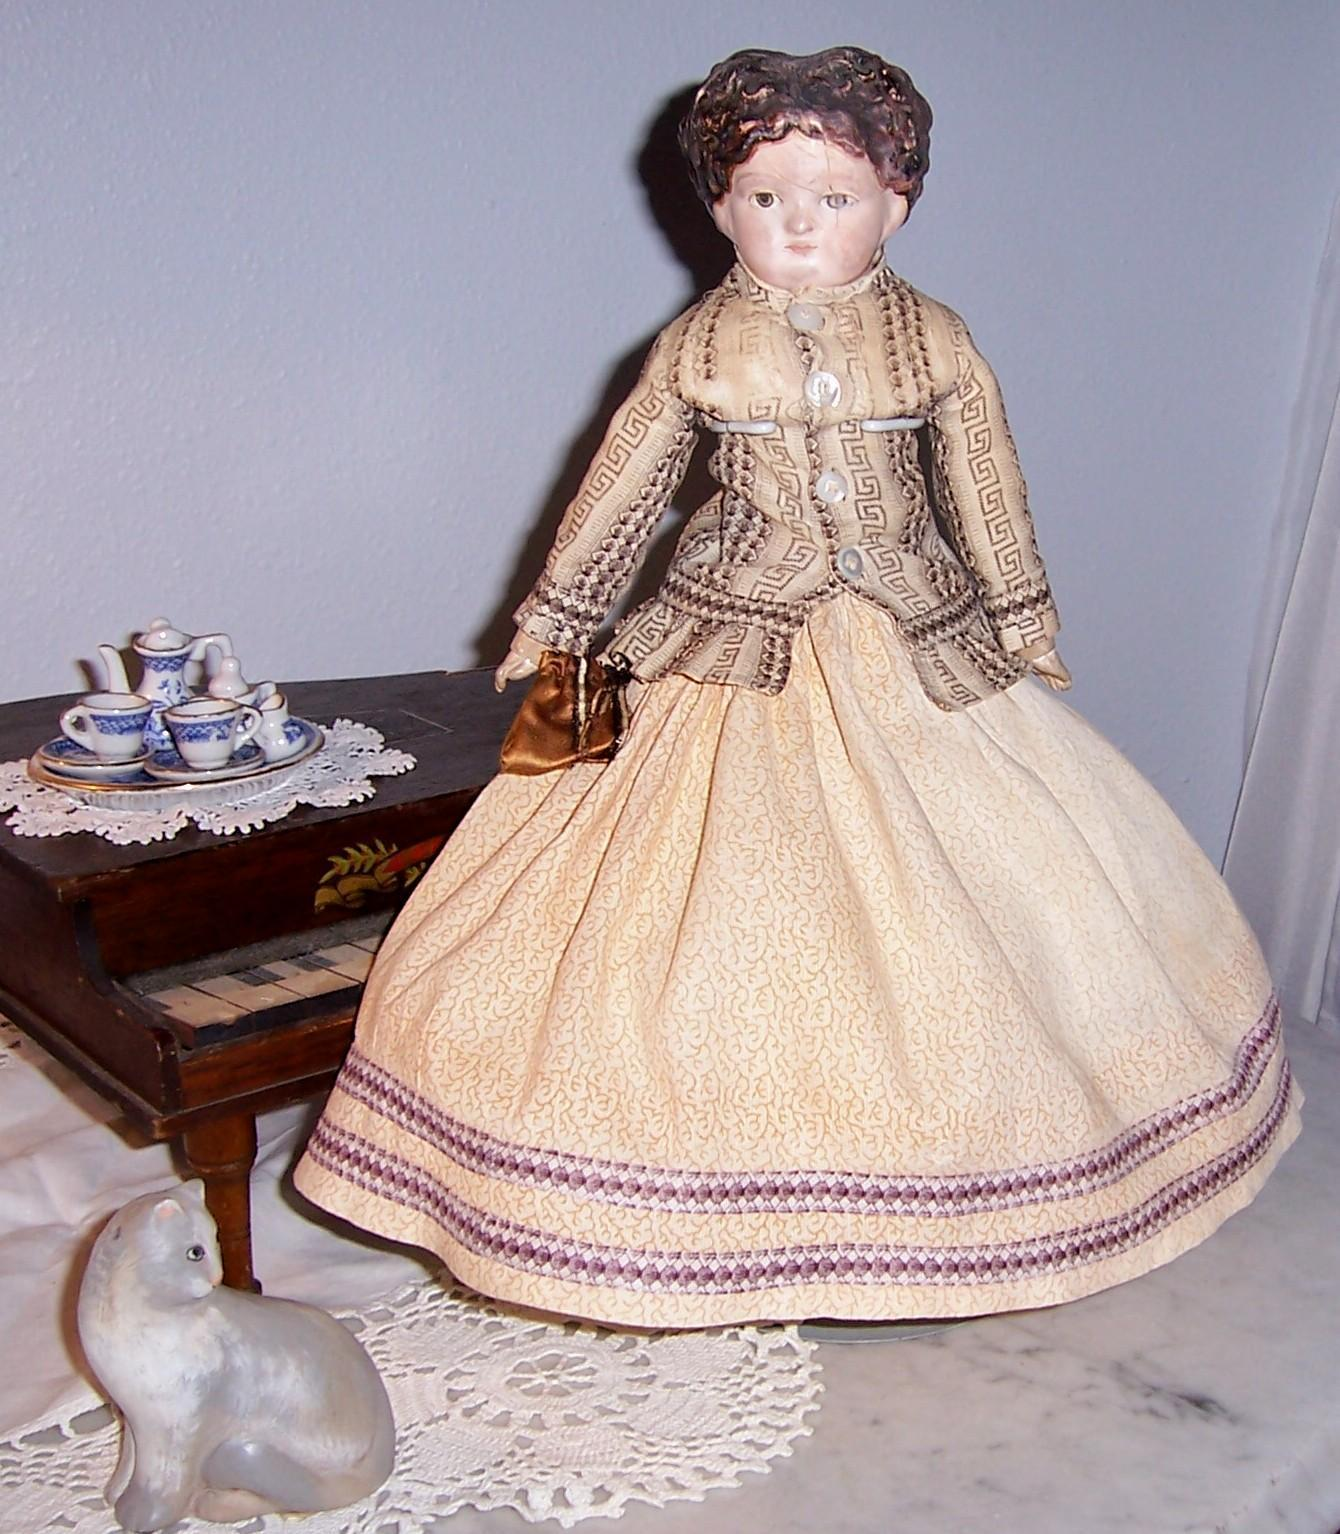 Rare, Unique Antique Papier Mache Doll w Carved Wood Movable Hands & Feet. Holtz Masse. Cuno Otto Dressel